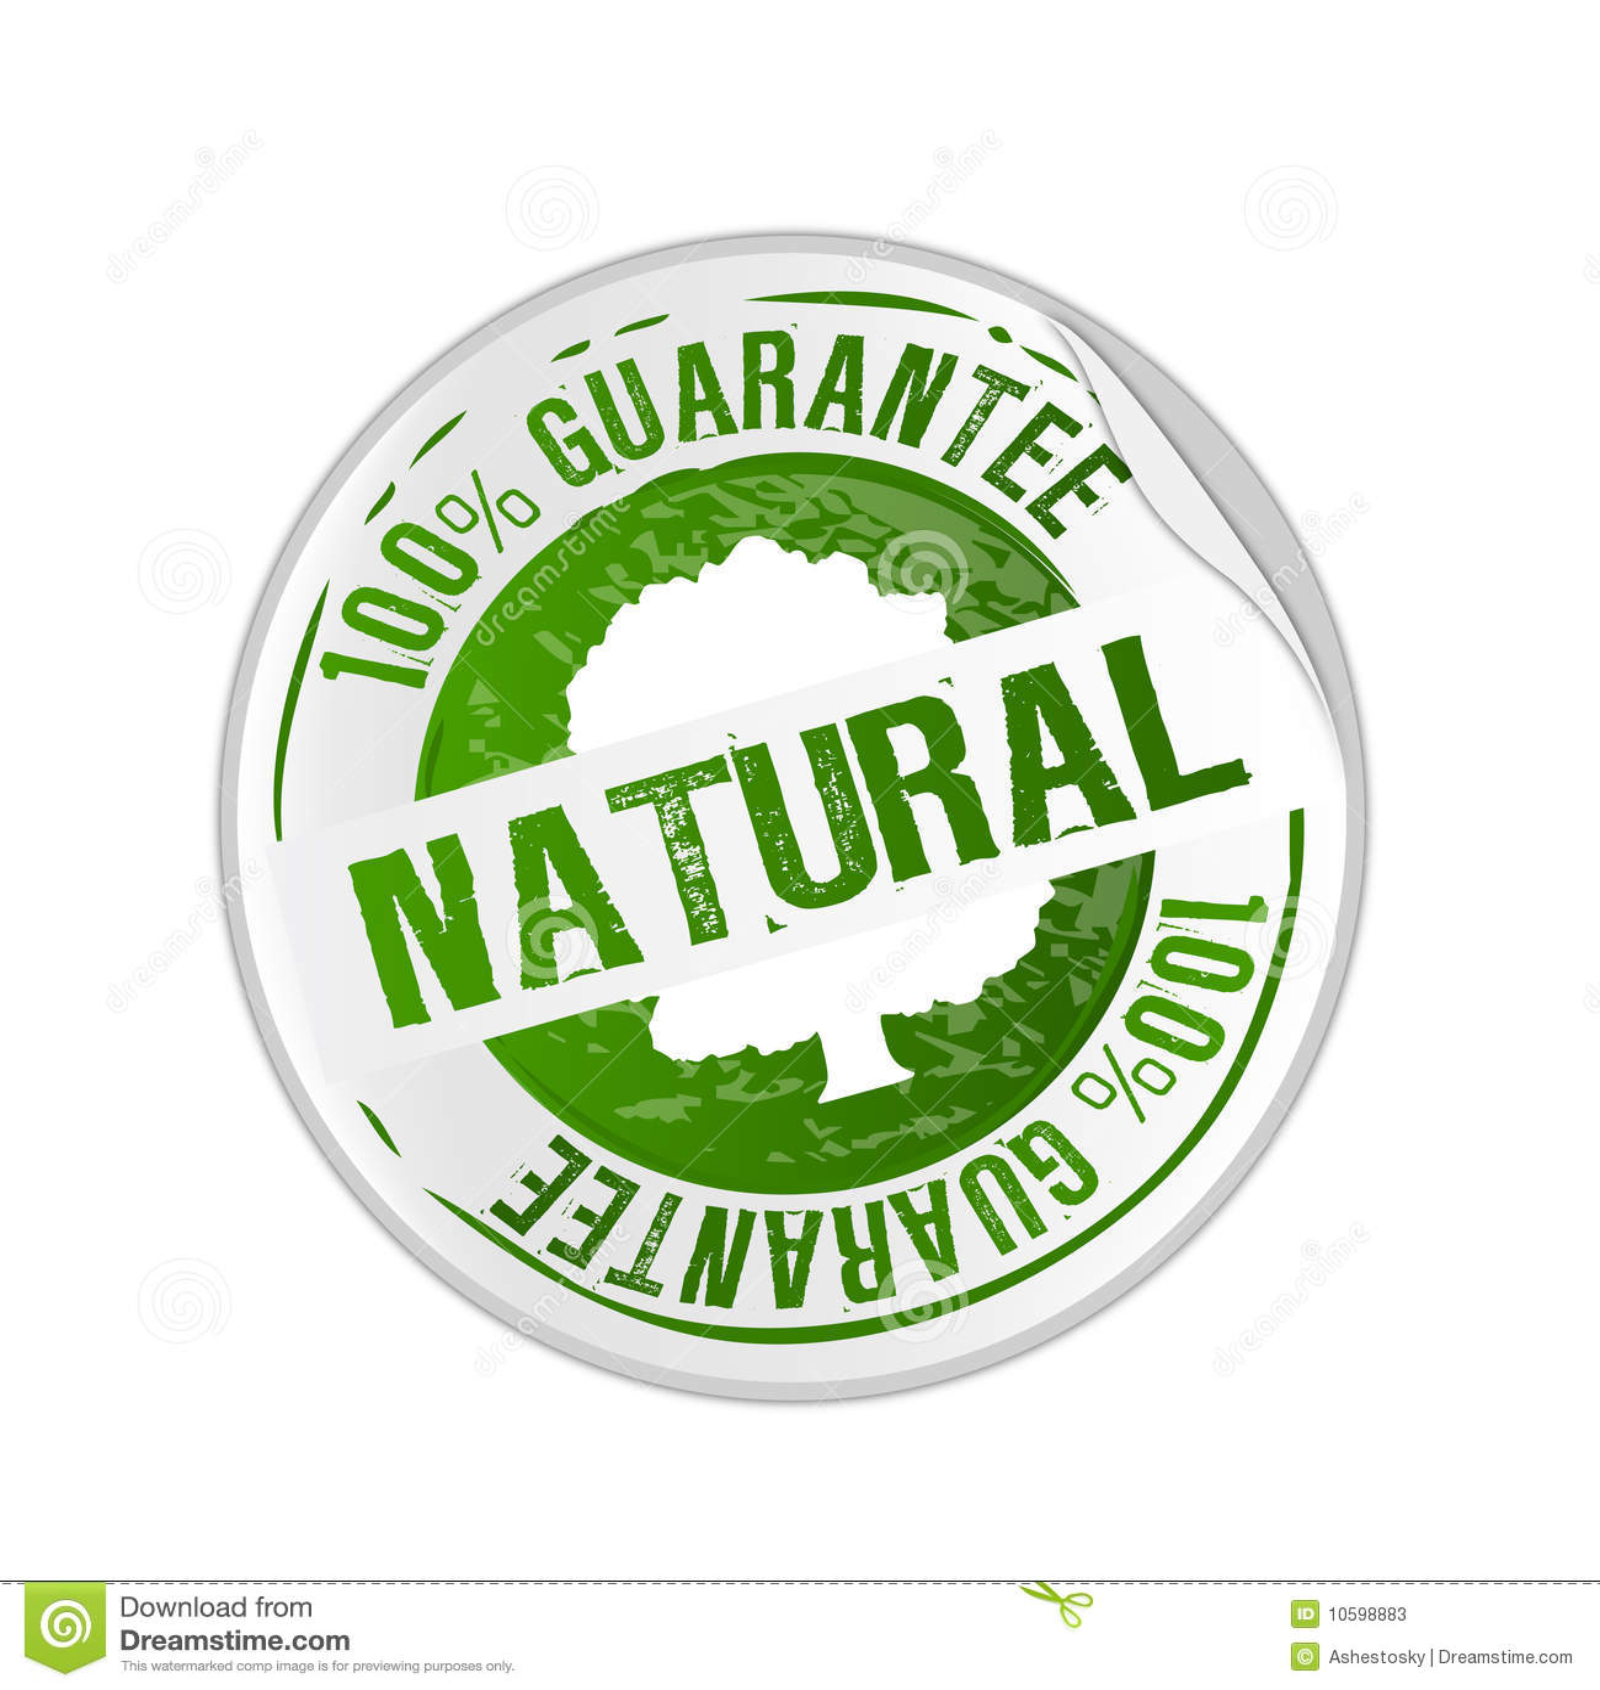 natural product guarantee stamp illustration 10598883 megapixl